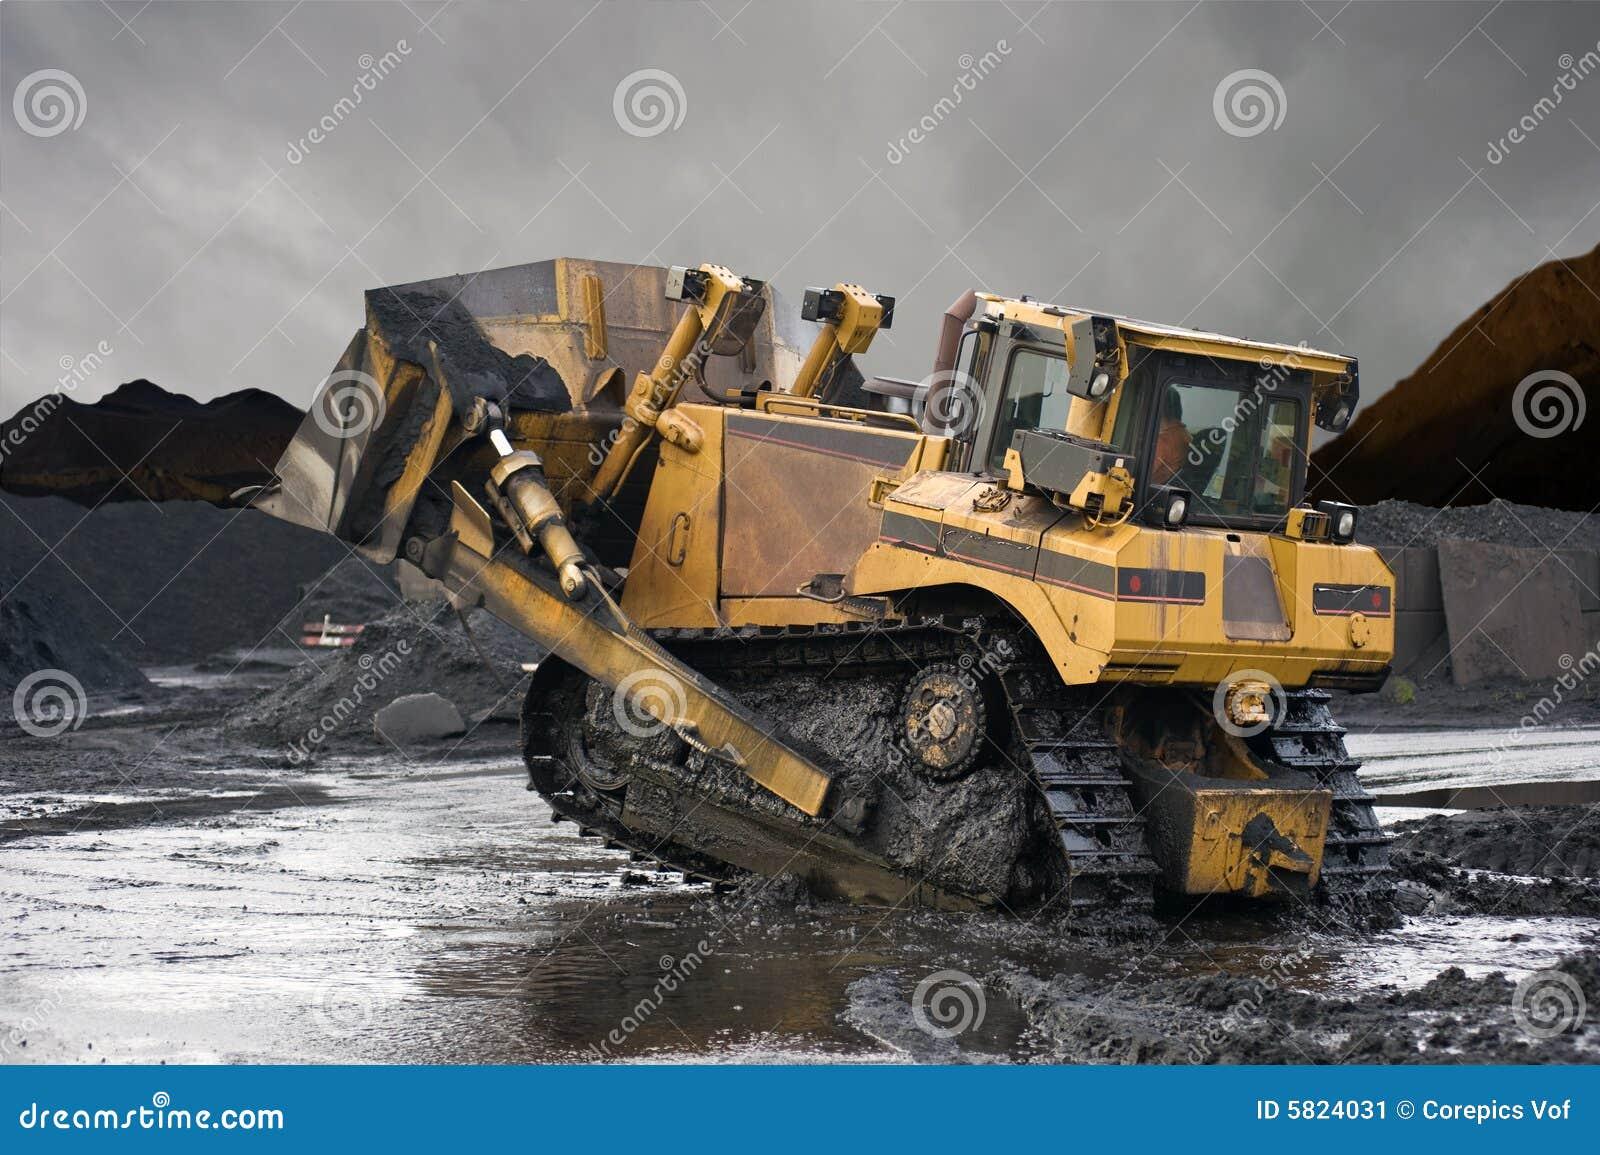 heavy duty mining shovel stock image image of bulldozer 5824031